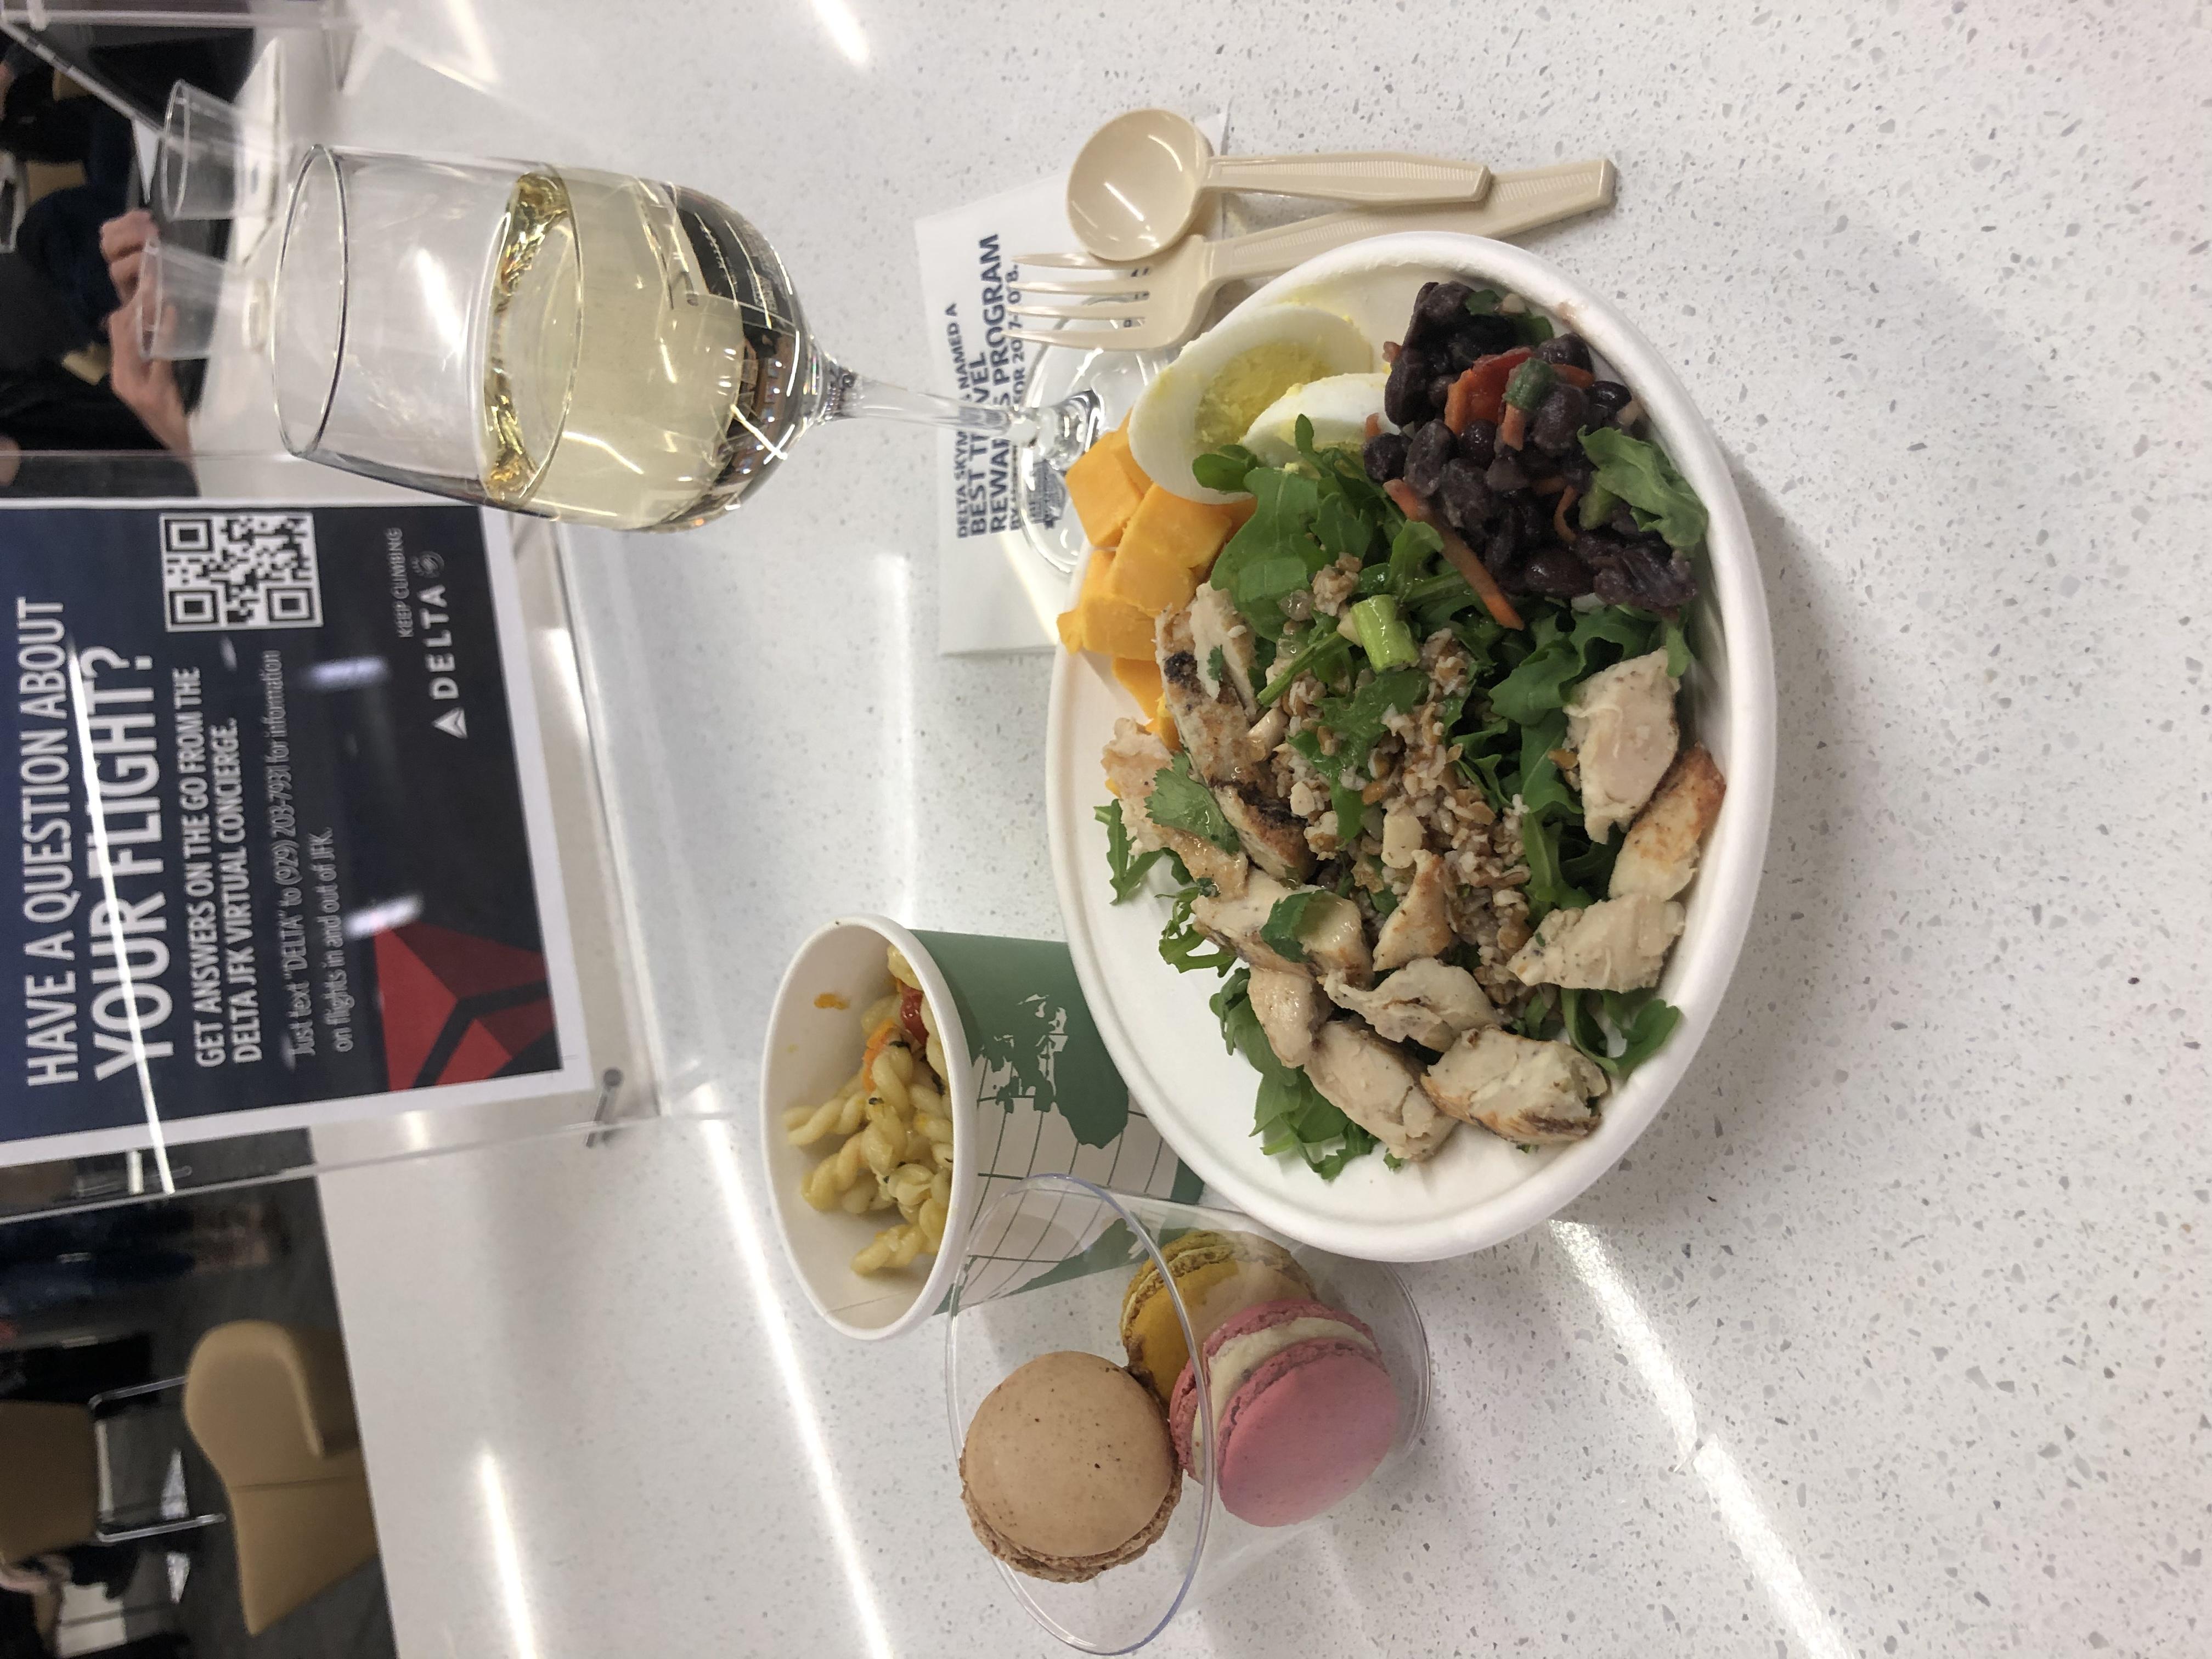 Delta Lounge @ JFK Review